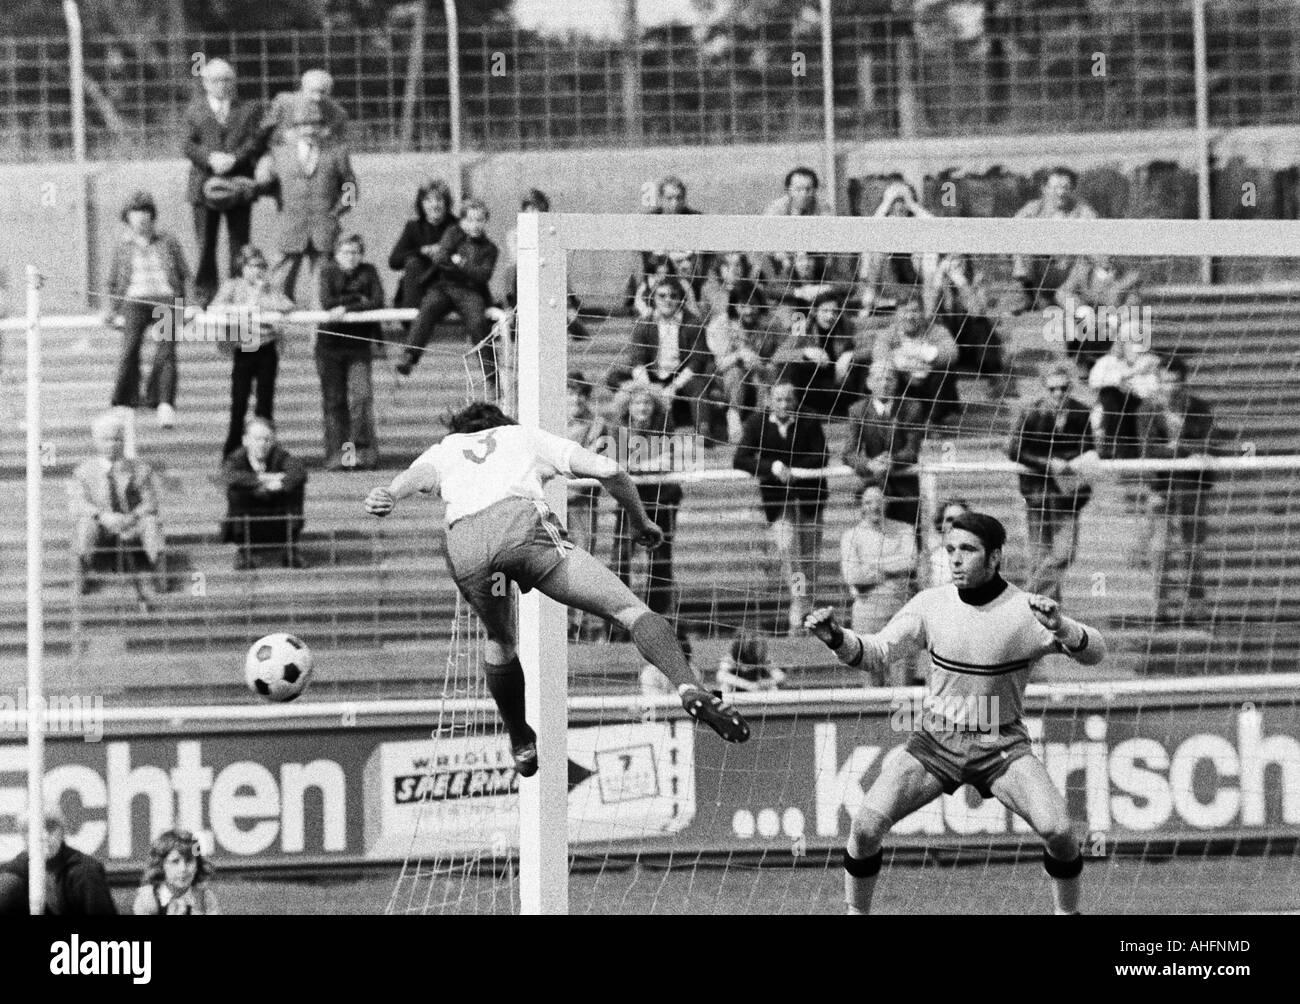 football, Bundesliga, 1971/1972, Rot-Weiss Oberhausen versus Werder Bremen 2:2, Niederrhein Stadium in Oberhausen, scene of the match, left an Oberhausen player, right keeper Guenter Bernard (Bremen) - Stock Image